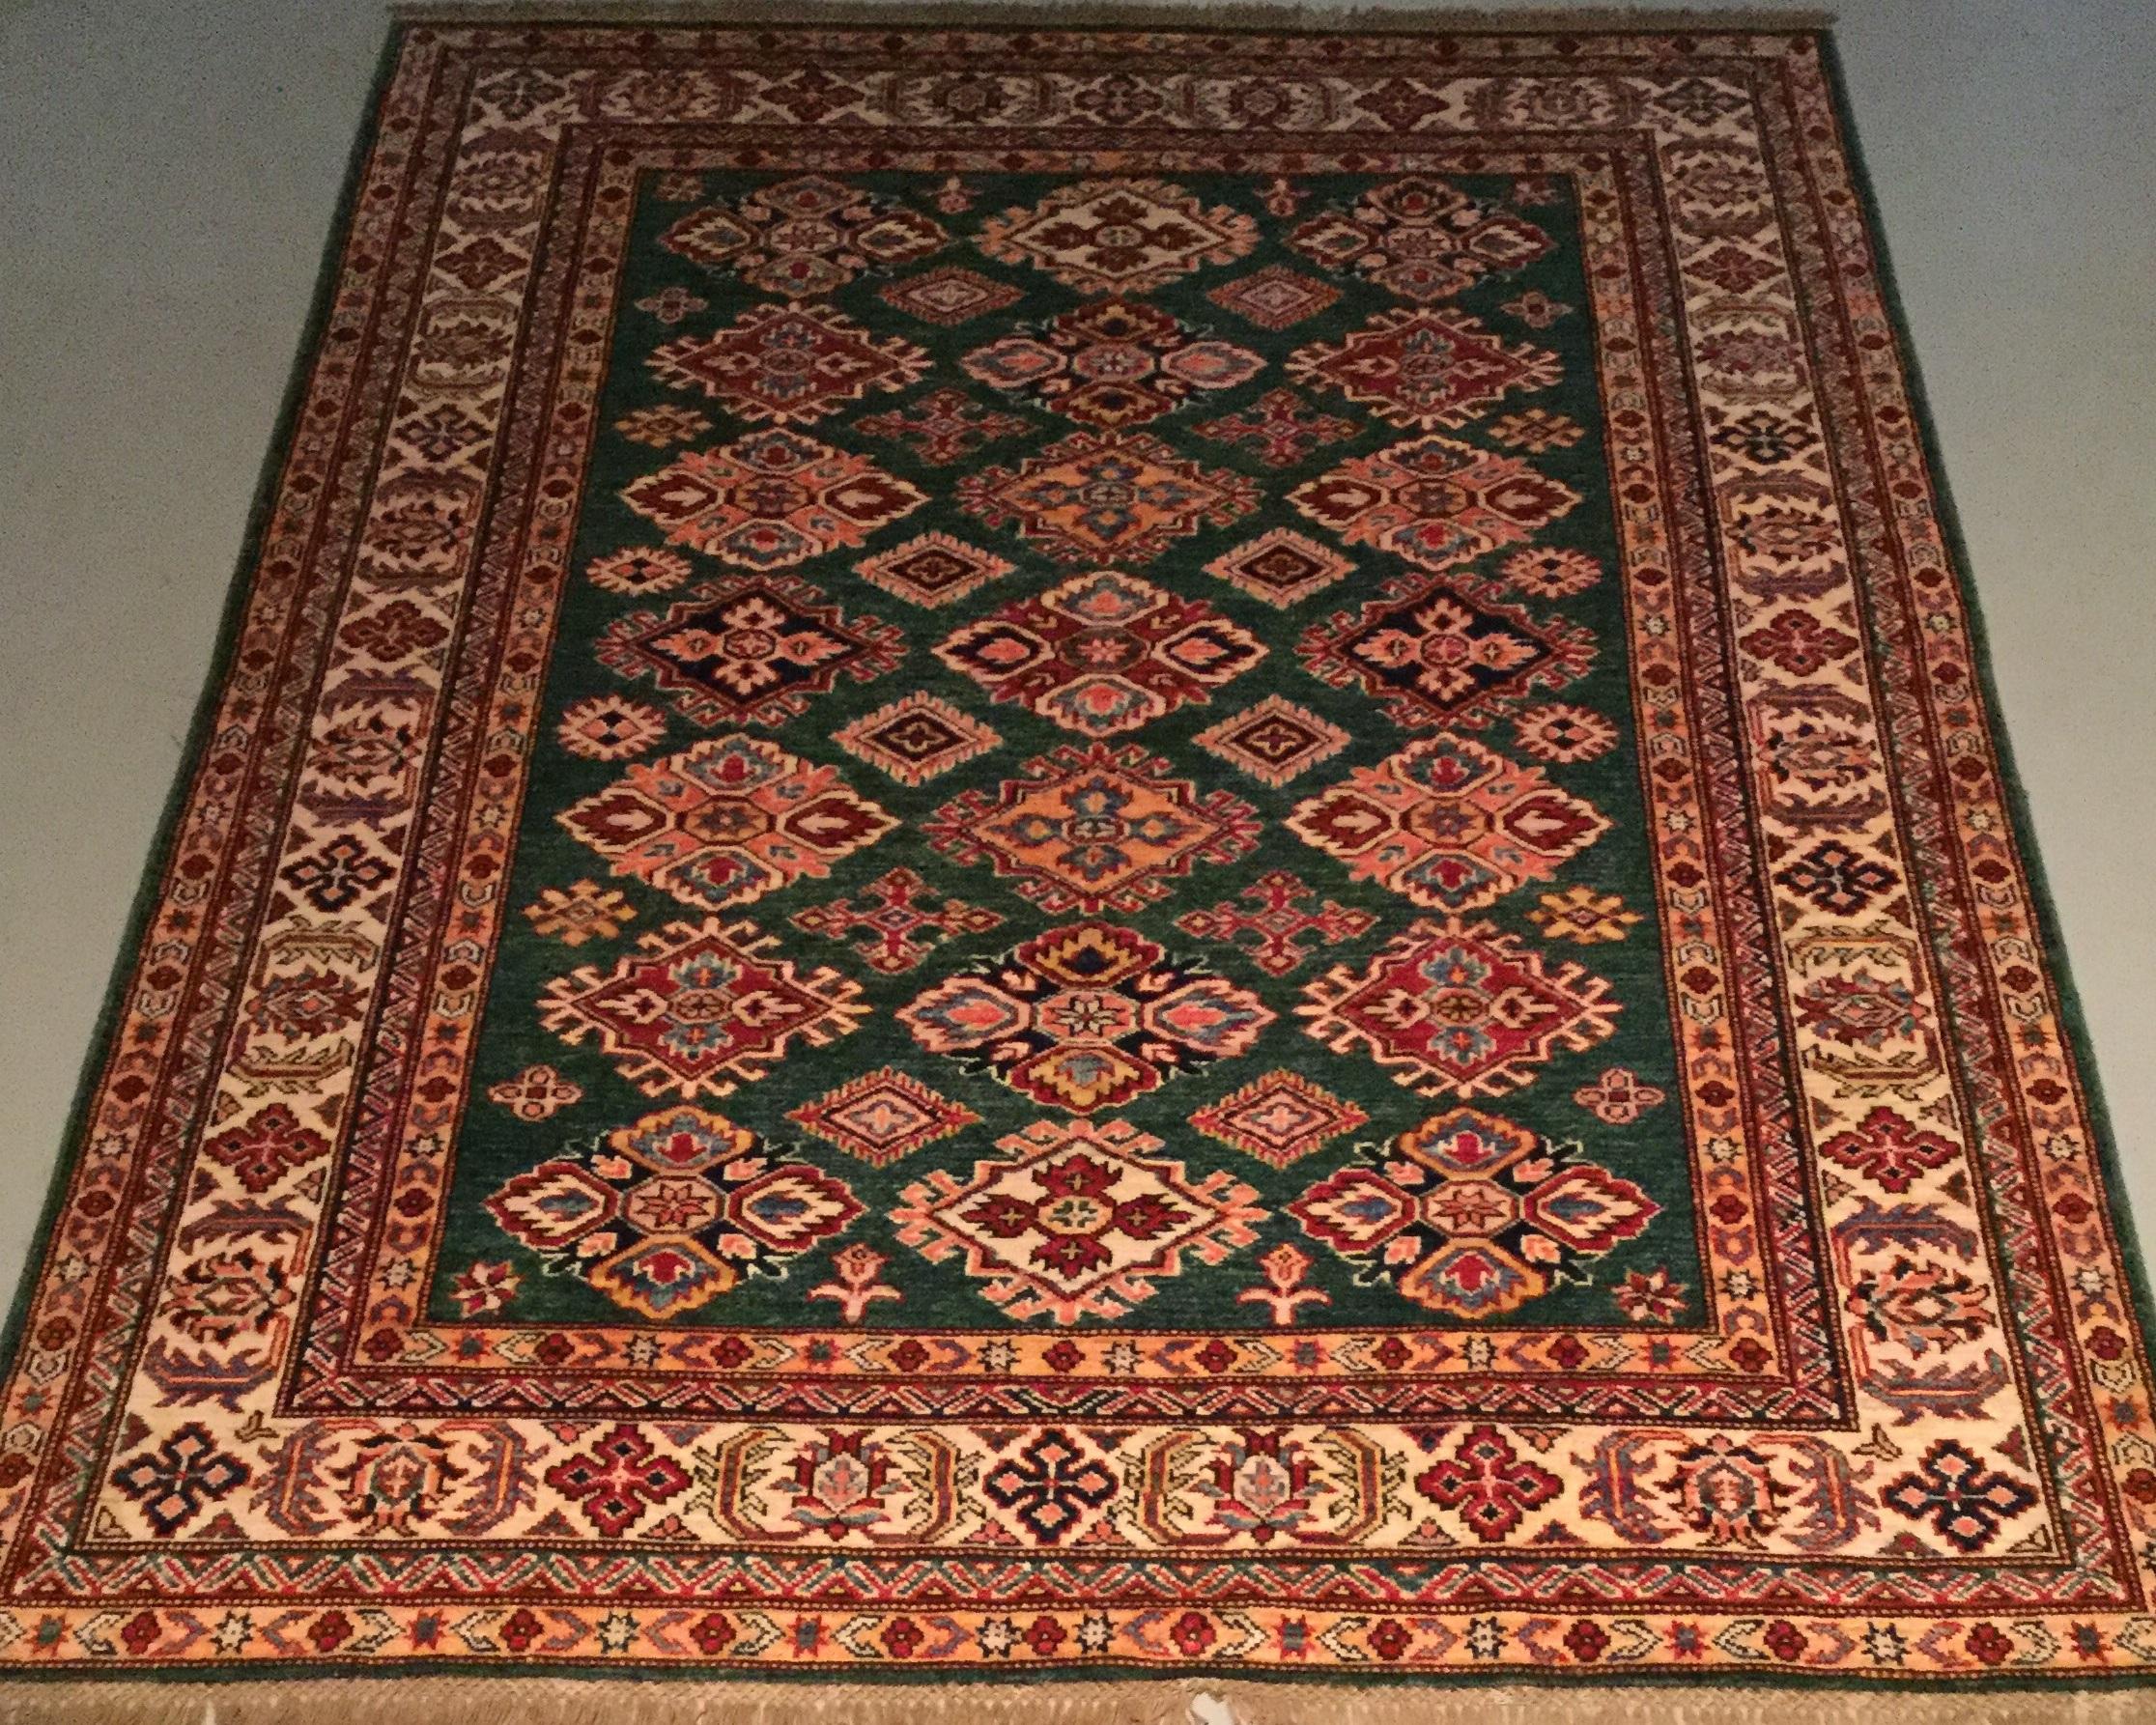 Afghan Kazak - Circa 2000'sSize Measurements: 190cm x 150cm